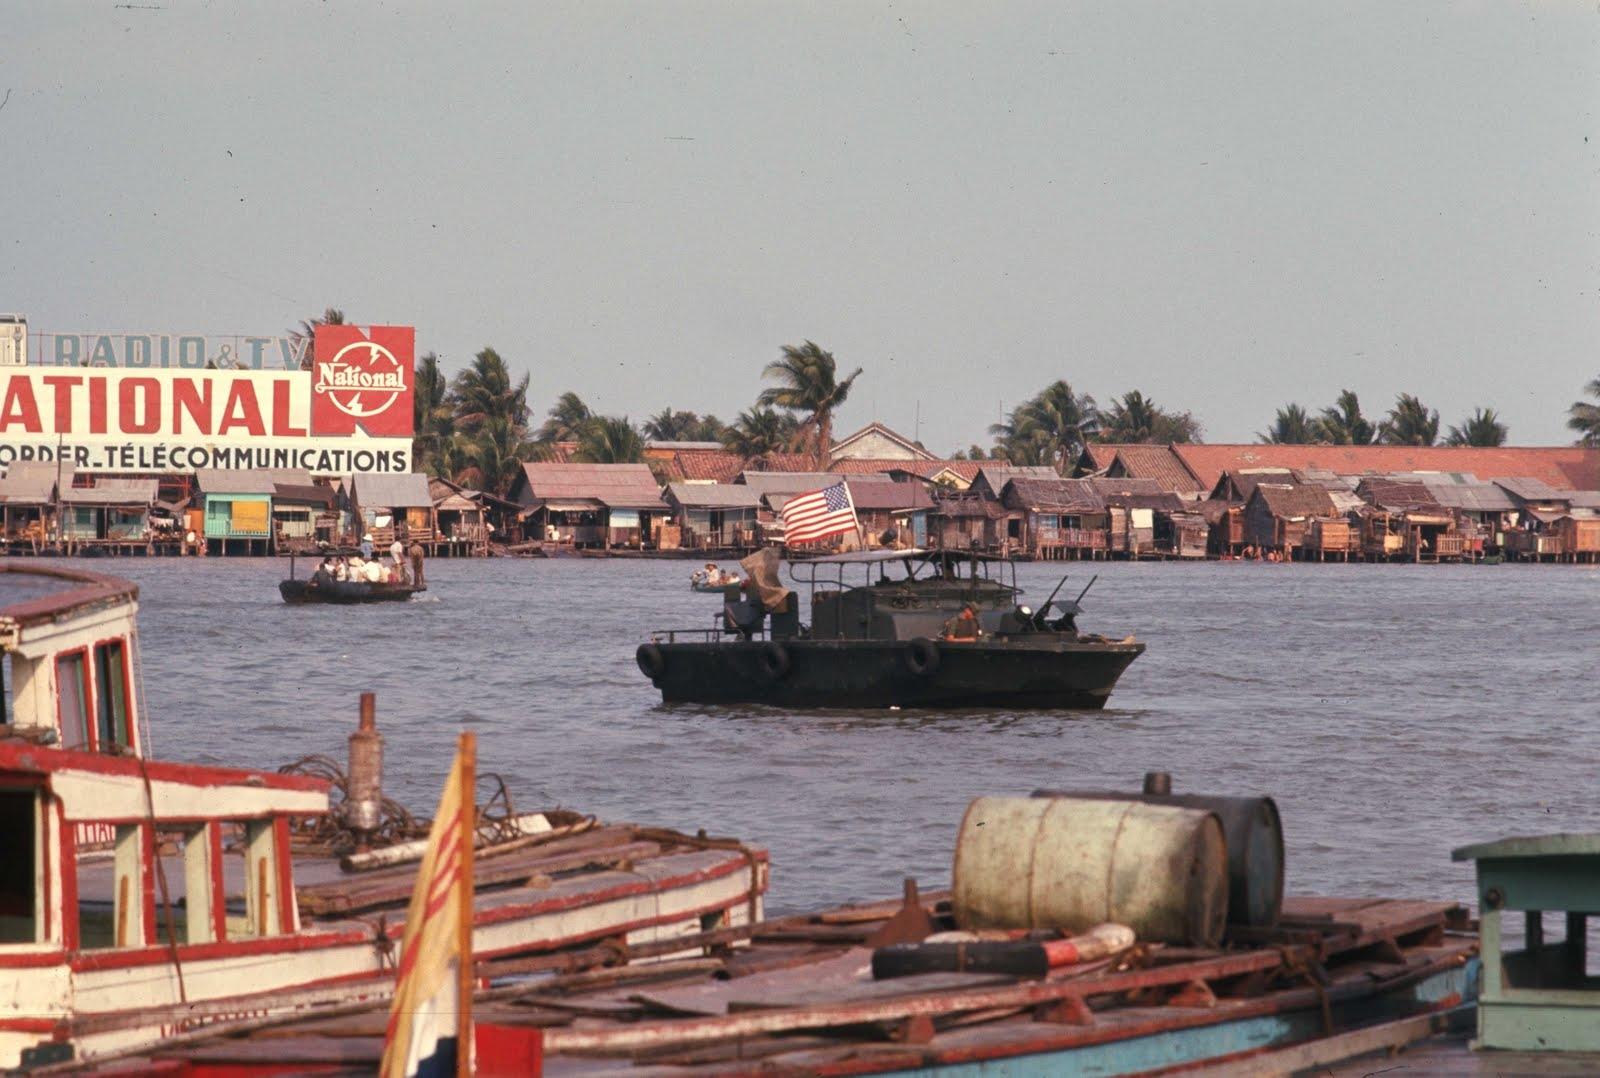 1969 Saigon by Brian Wickham Patrol